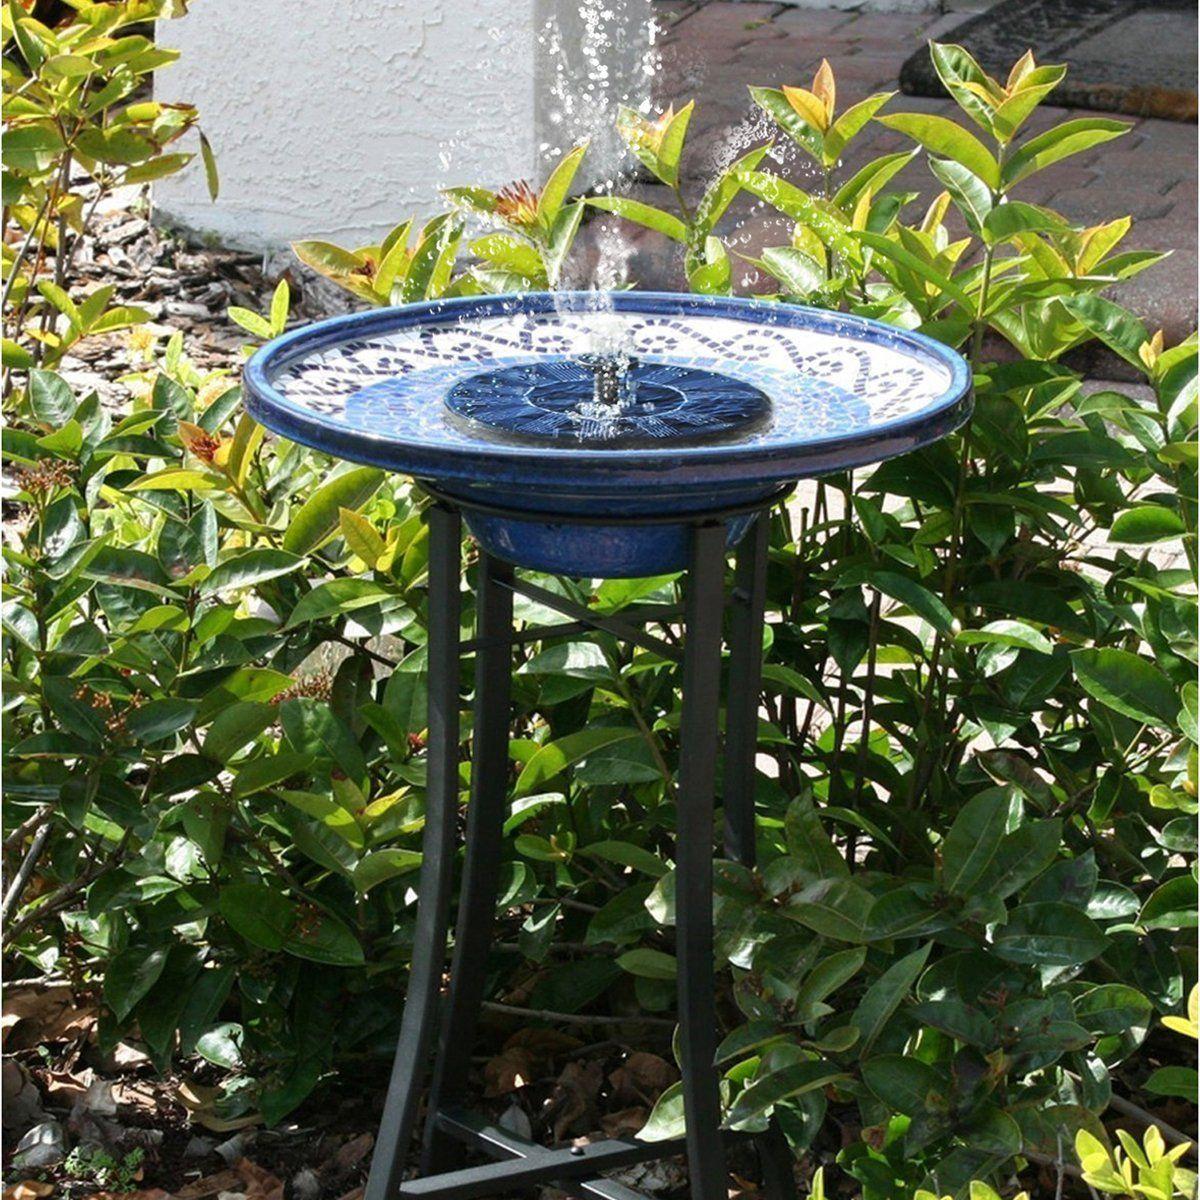 Amazoncom  Cute Solar Powered Bird Bath Fountain Pump Free - Amazon pond pumps